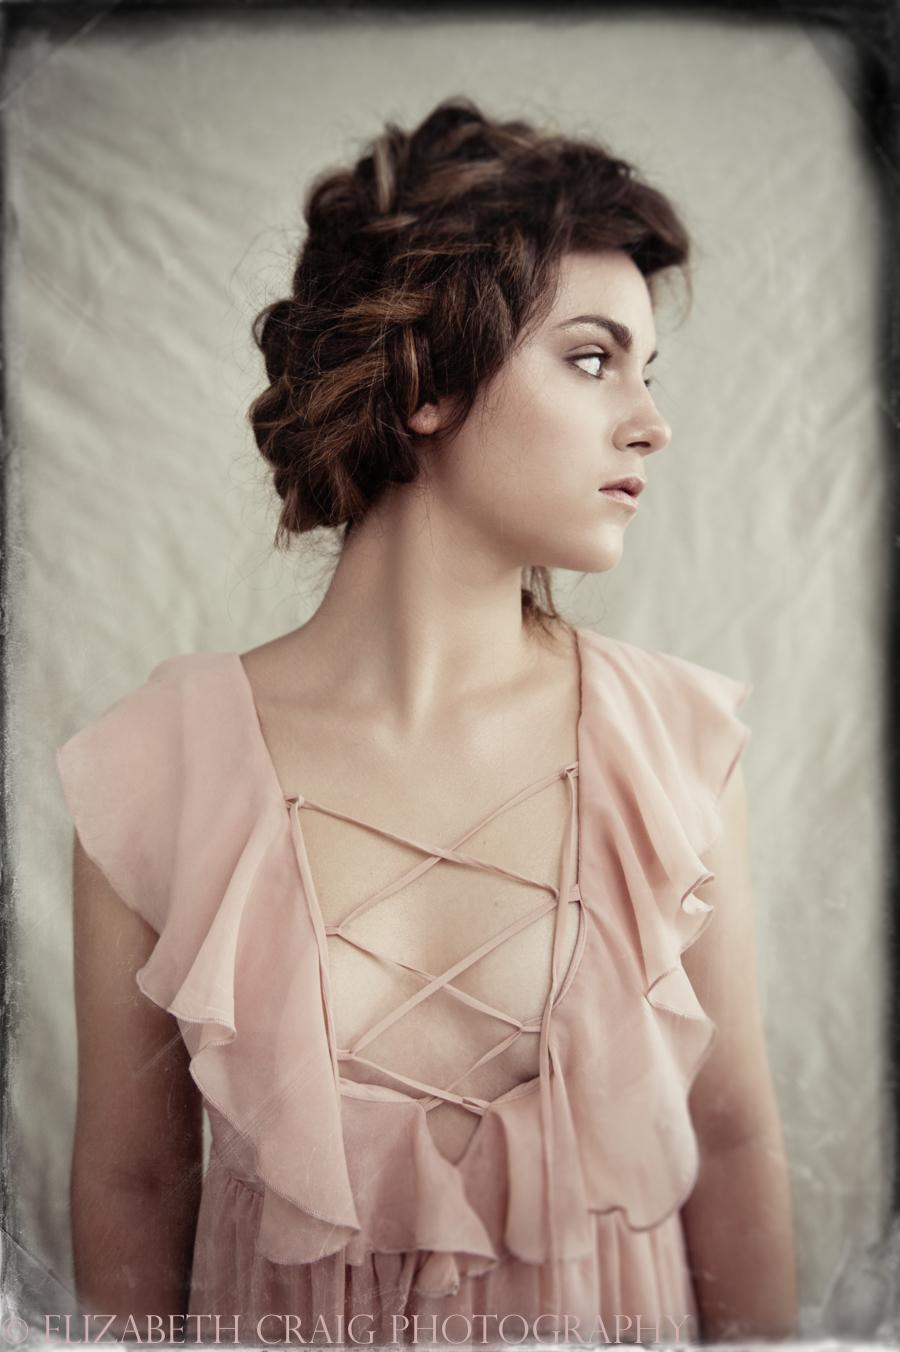 vintage-romantic-boudior-photography-elizabeth-craig-photography-058